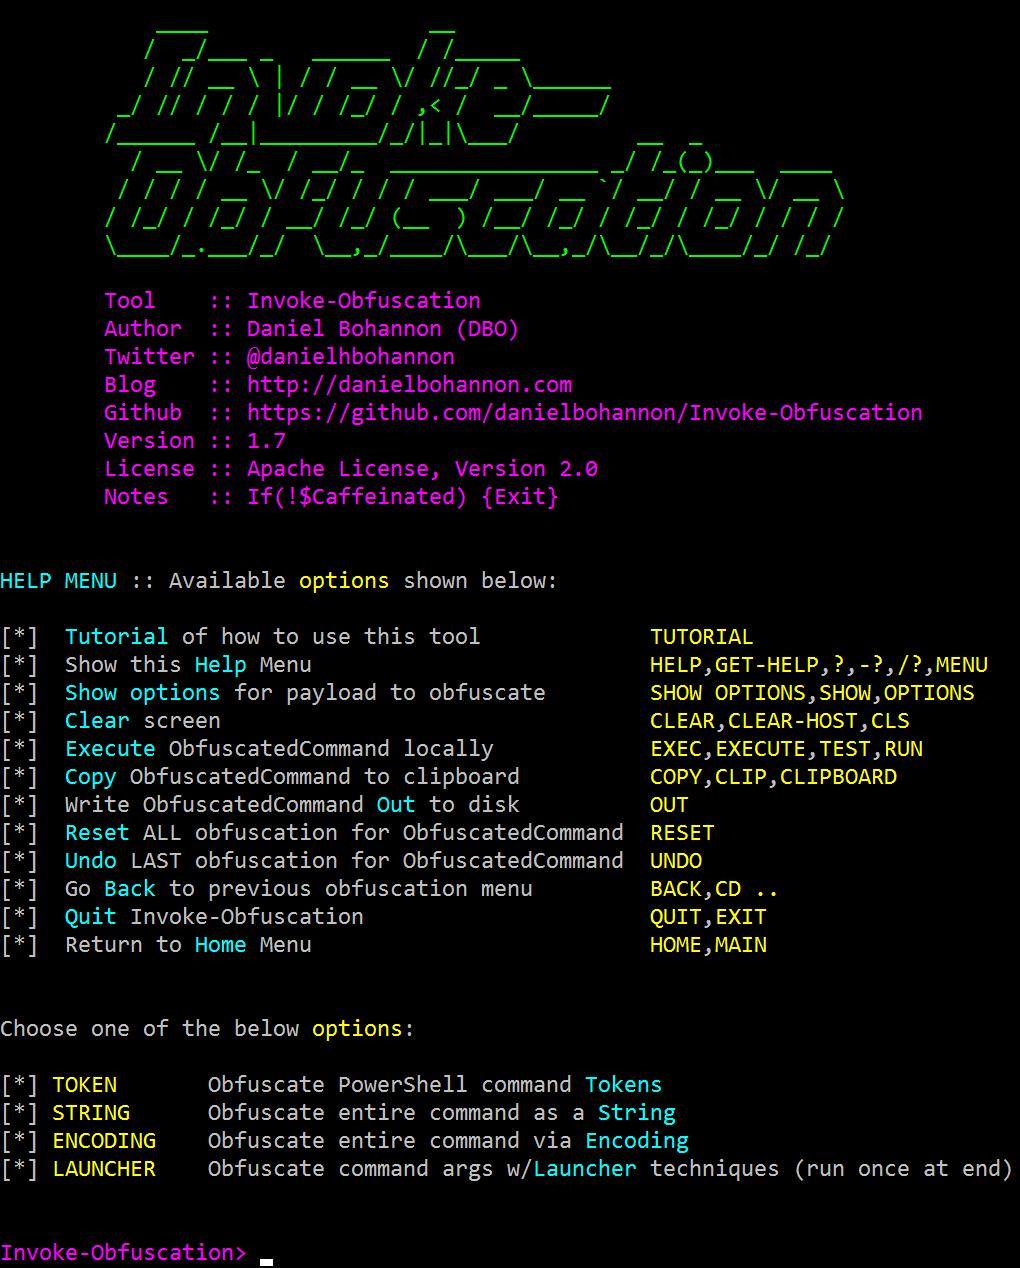 Invoke-Obfuscation - PowerShell Obfuscator